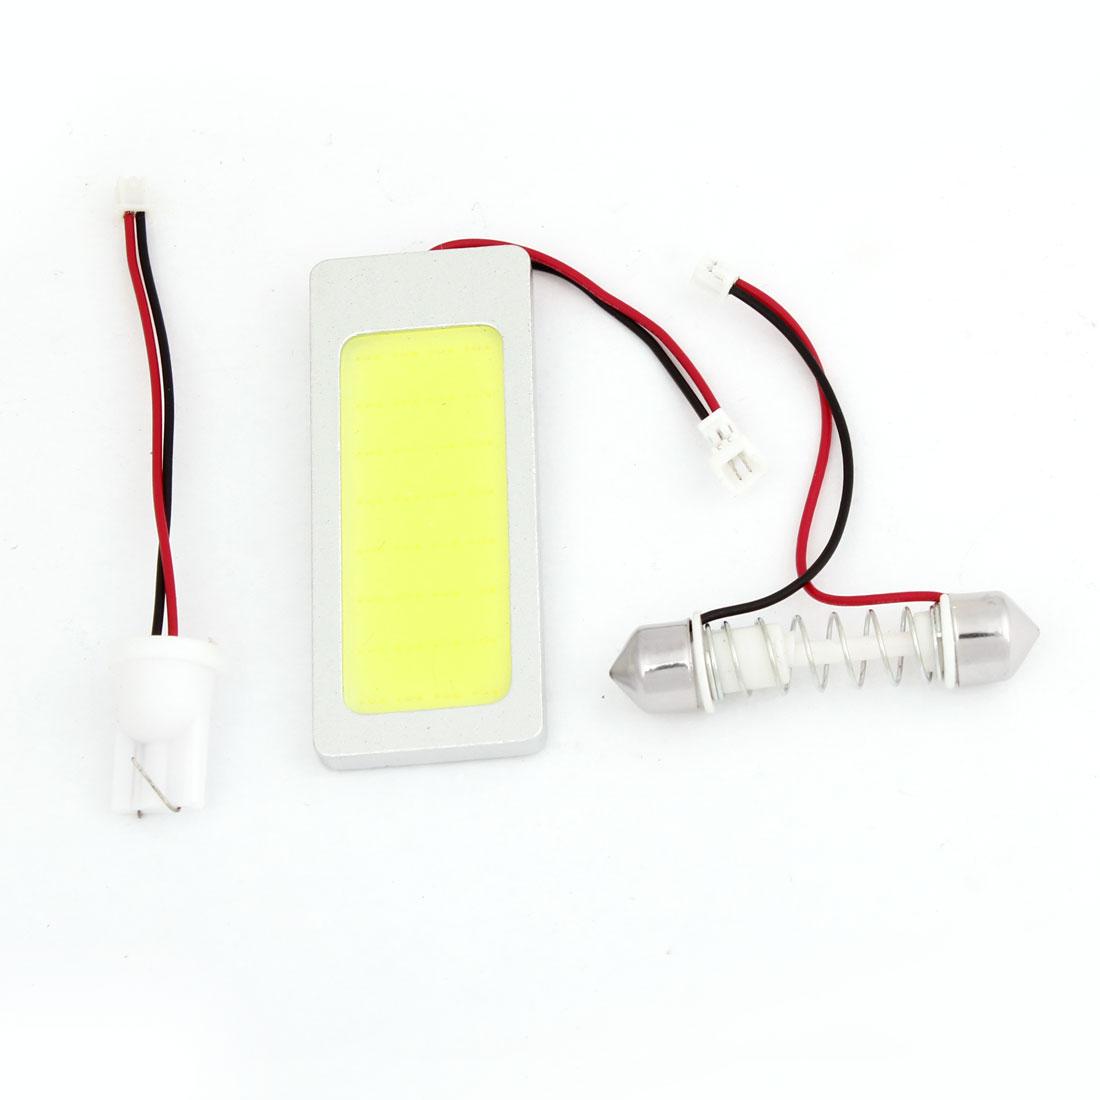 Car White COB LED Dome Light Panel w T10 Festoon Adapter DC 12V 1W